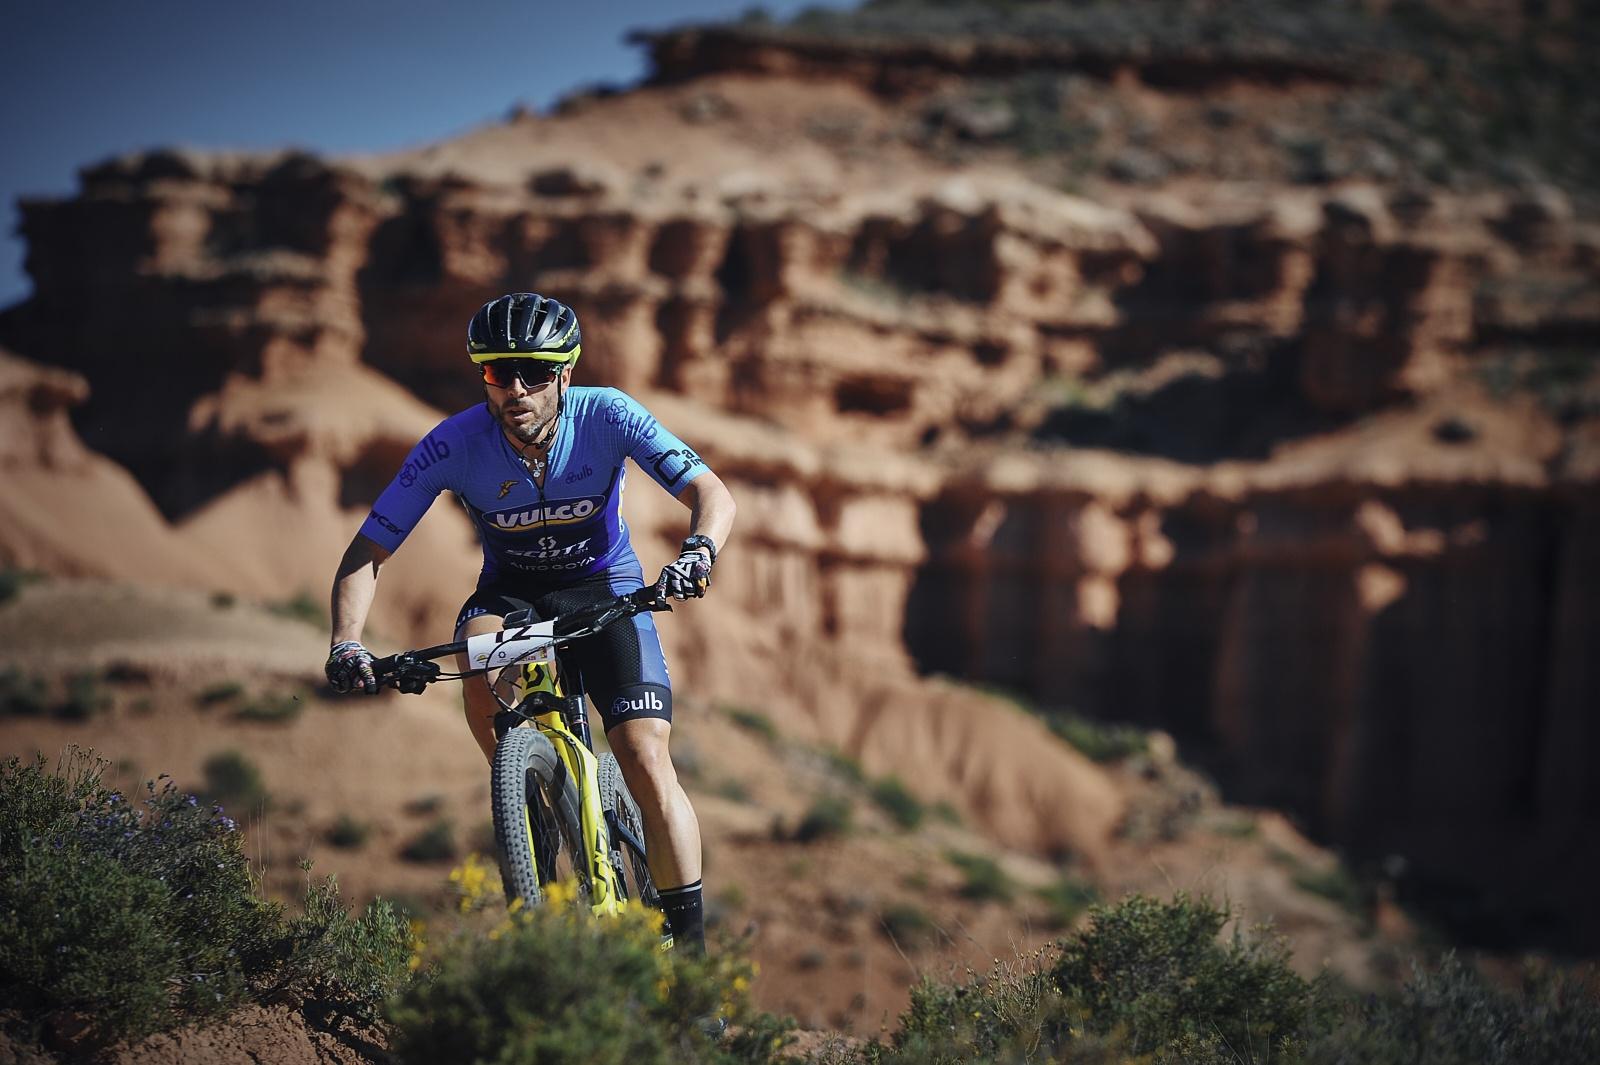 Aragón Bike Race Calatayud 2021 - QuieroMisFotos.com - Sergio Tomico, Photography